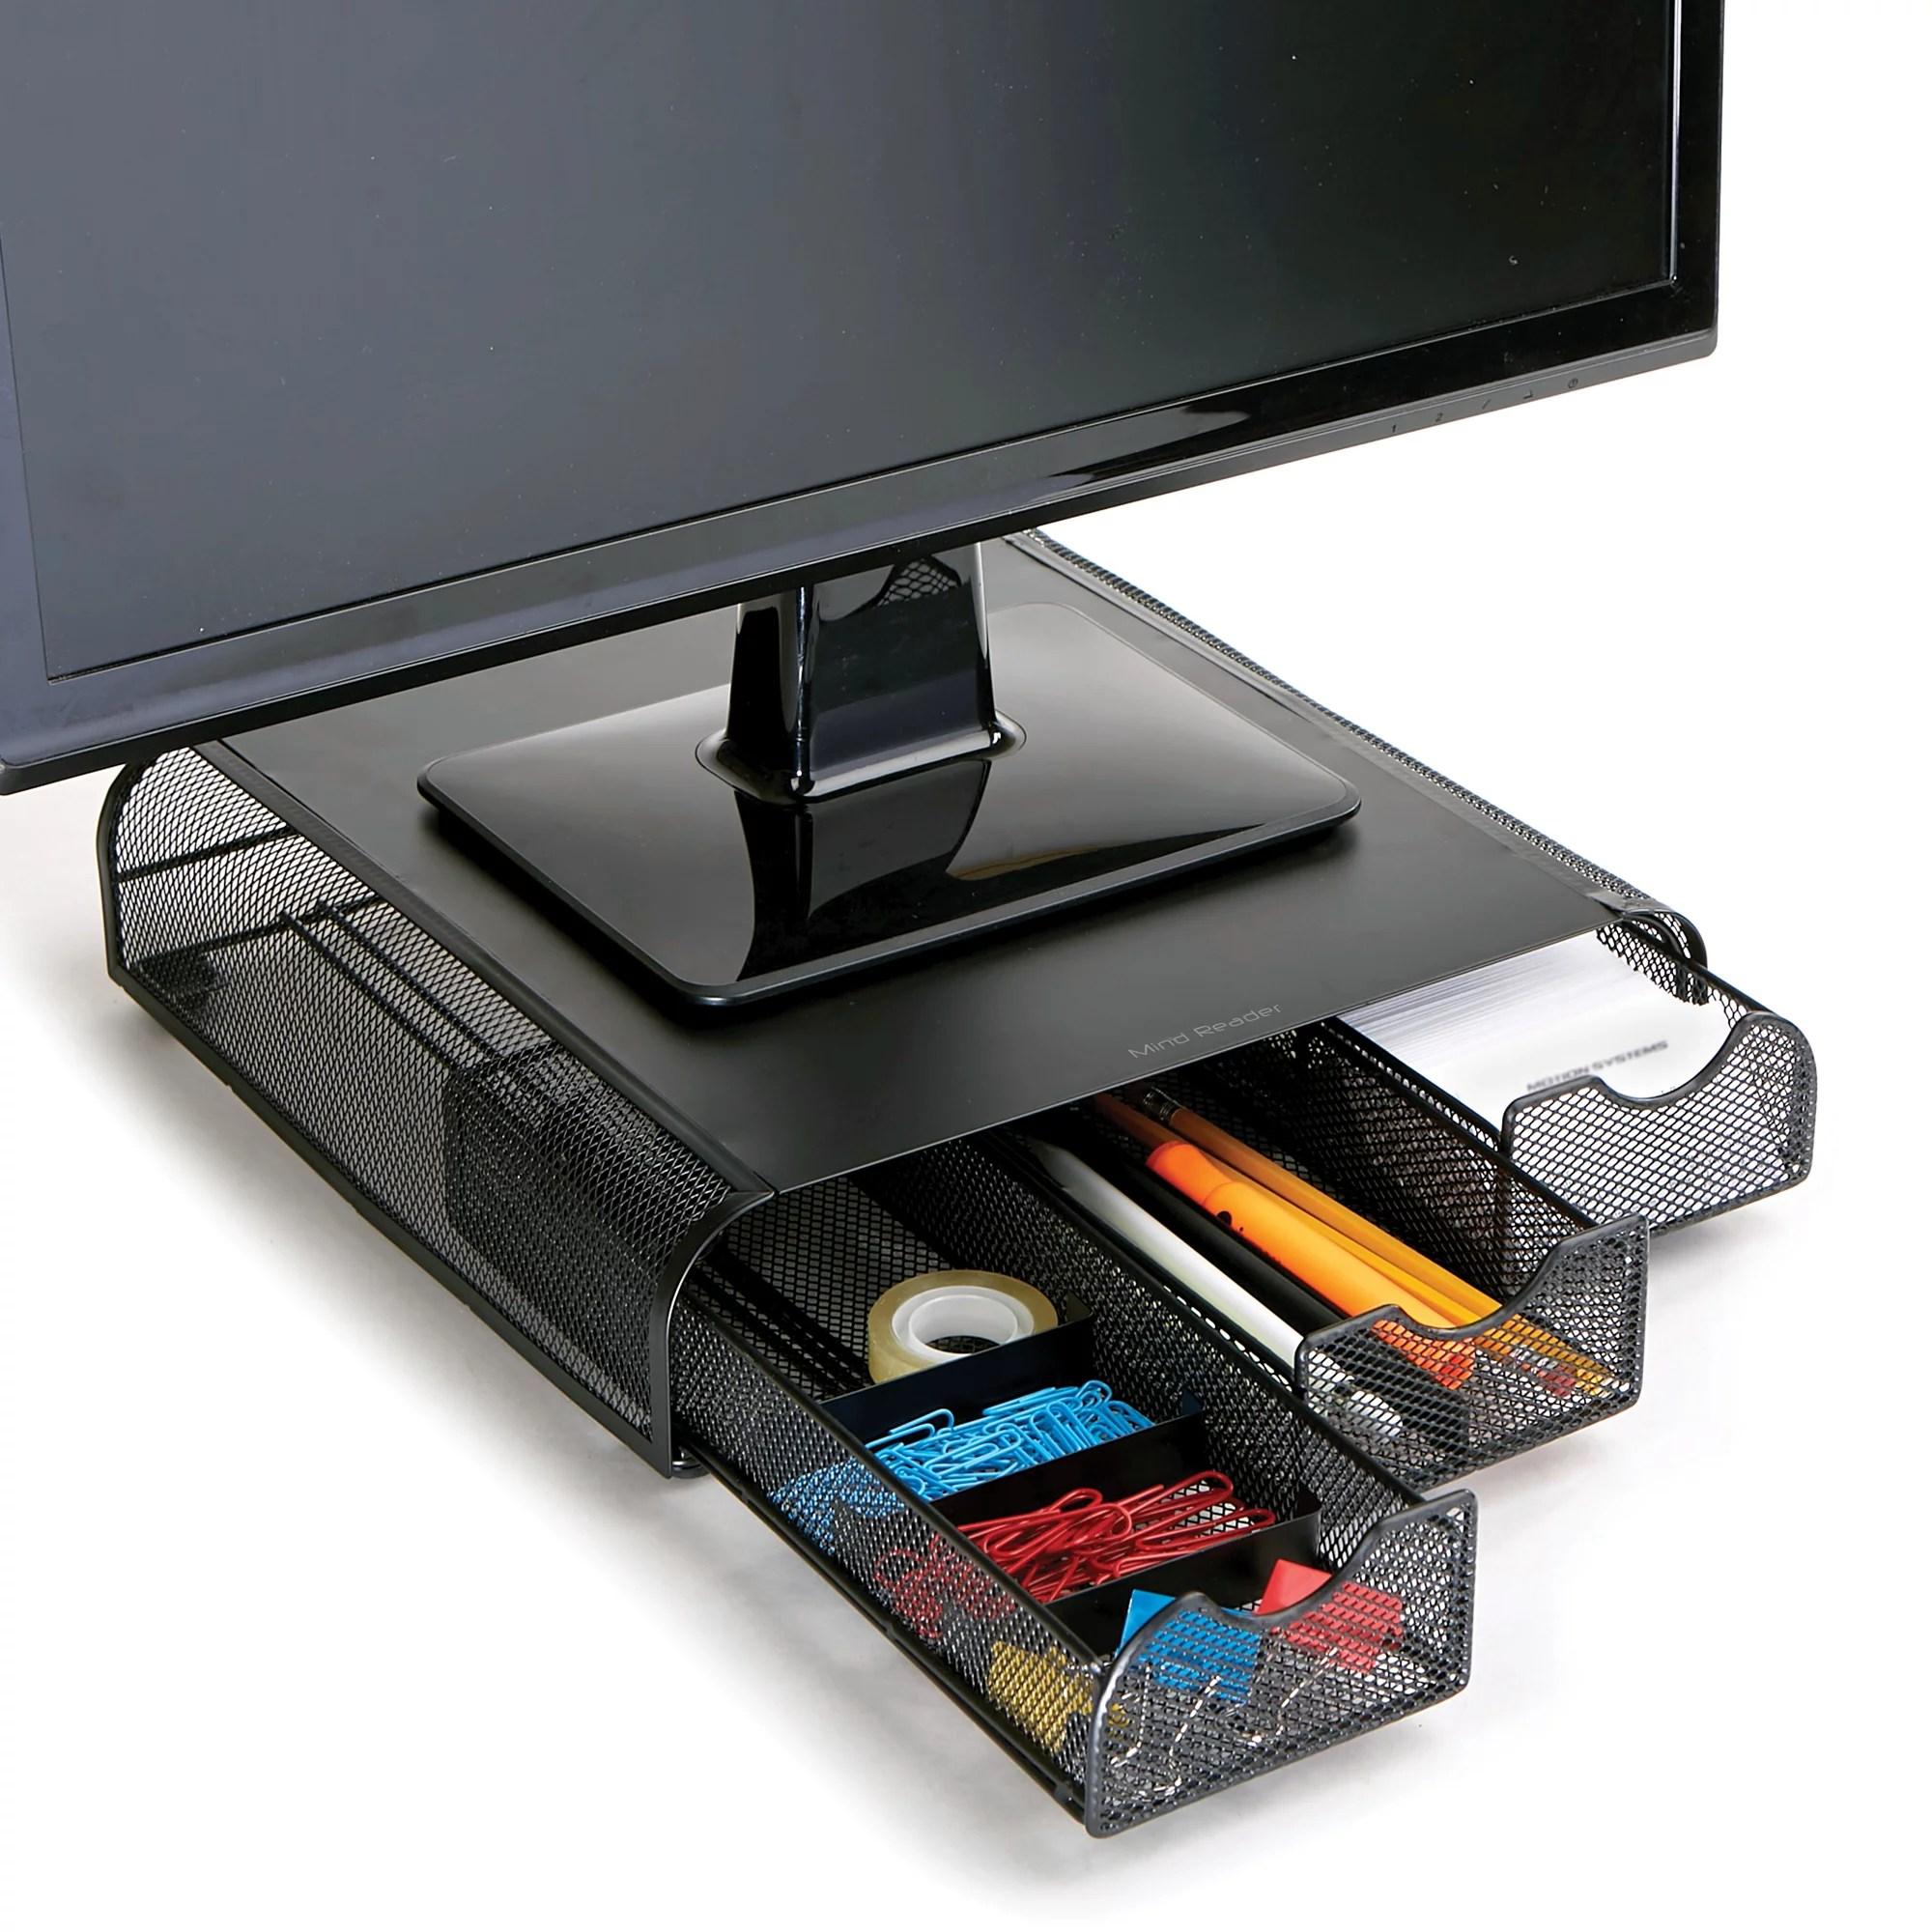 Mind Reader PC, Laptop Imac, Monitor Stand with Three Drawer Desk Organizer, Black Metal Mesh